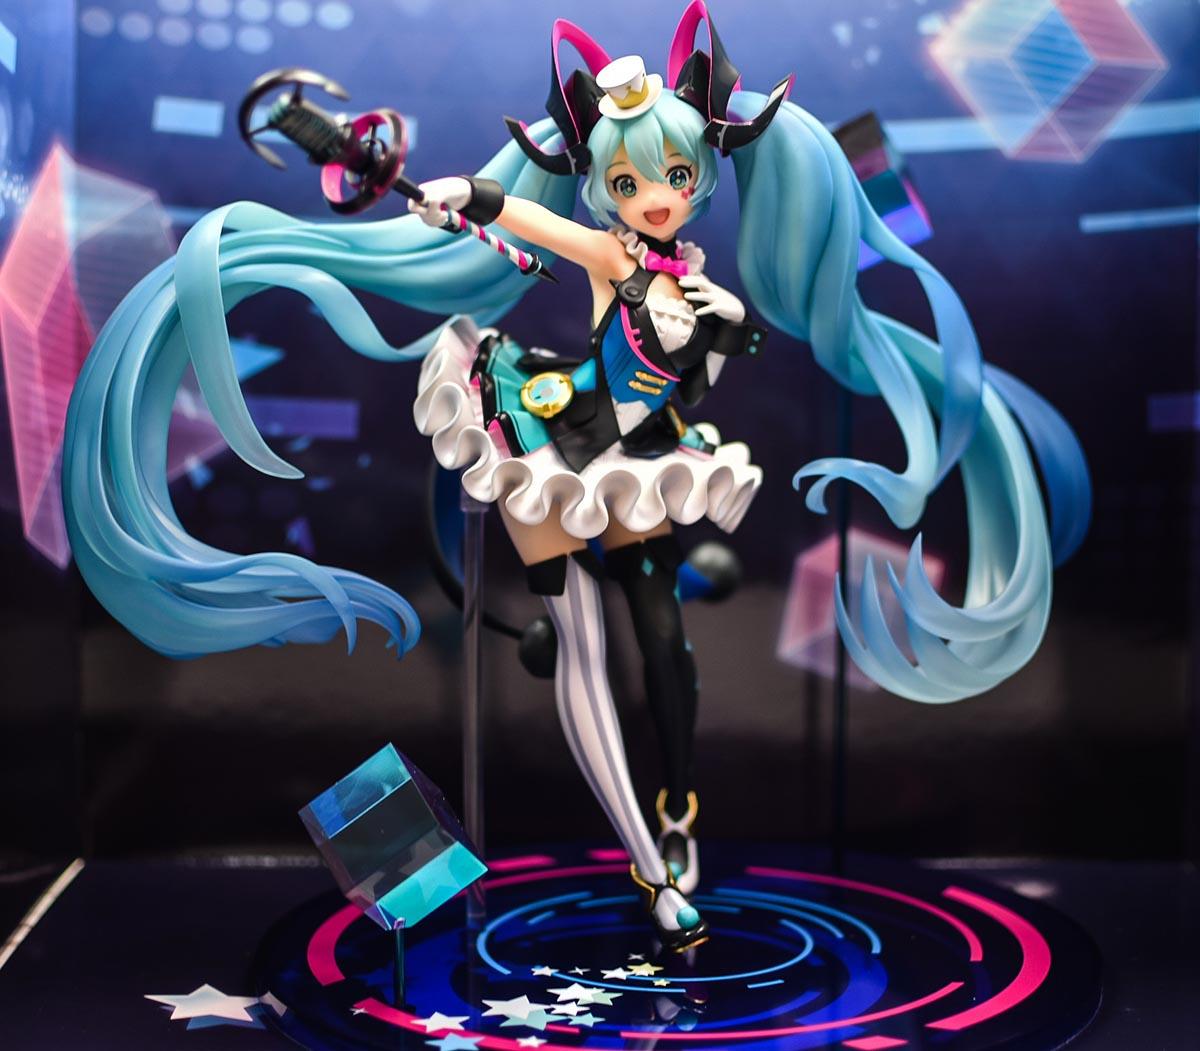 F:NEX 初音ミク「マジカルミライ 2019」Ver. フィギュアレビュー40